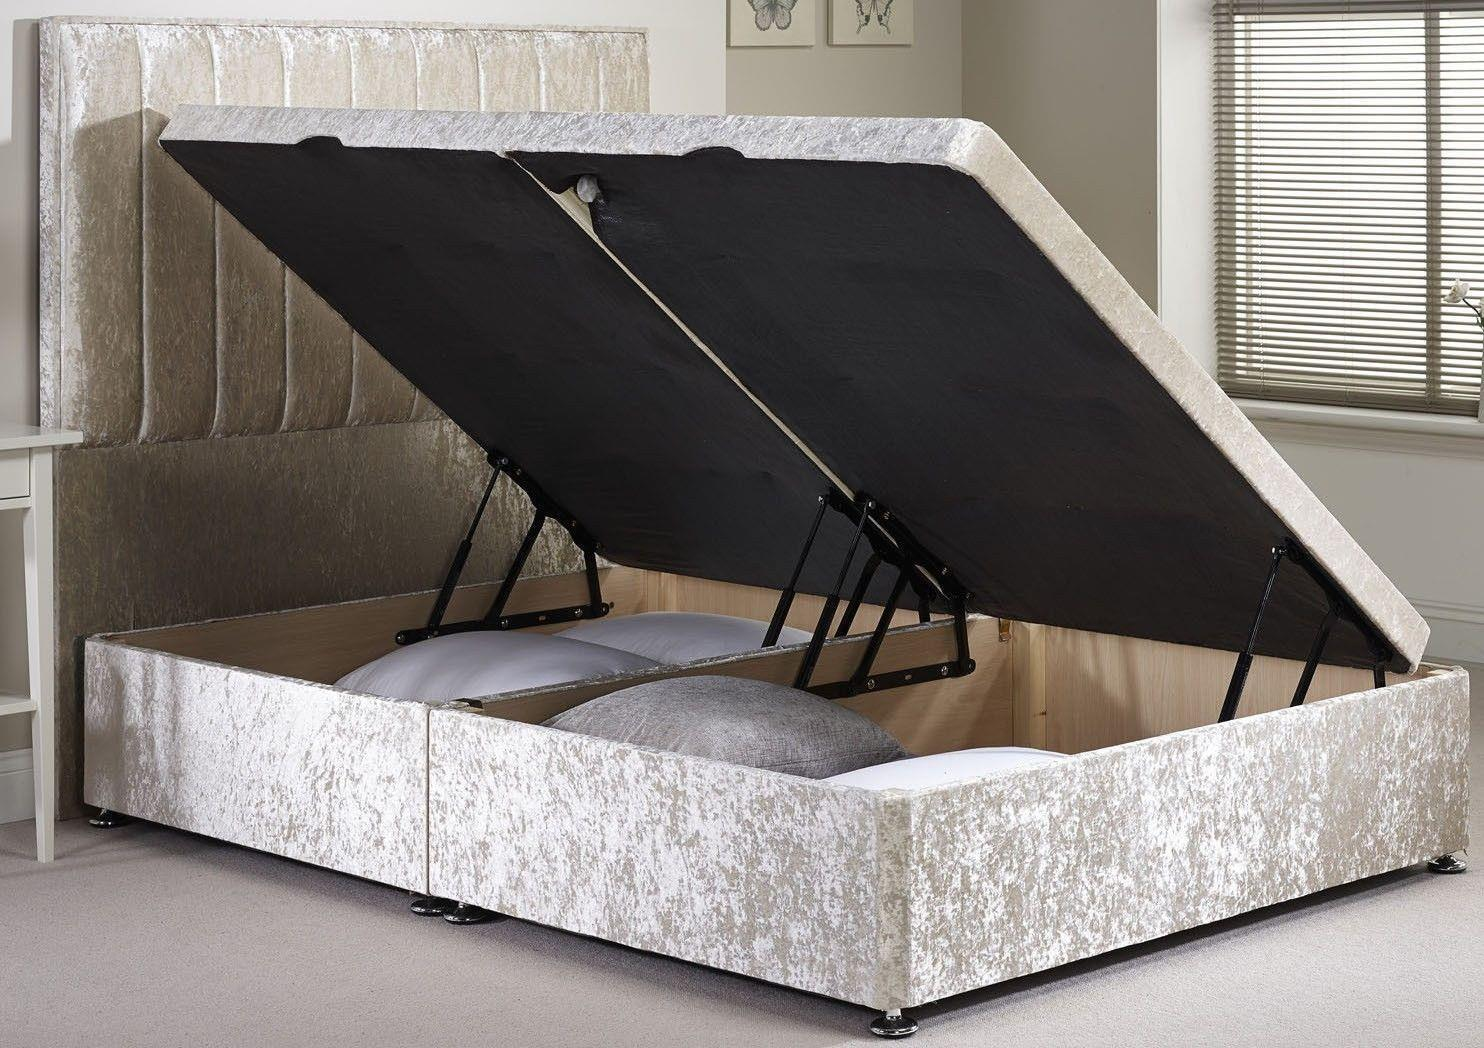 dbbeb3ce6d0a Divan Ottoman Side Lift Storage Bed Single 4'6 Double 5ft King Size AMAZING